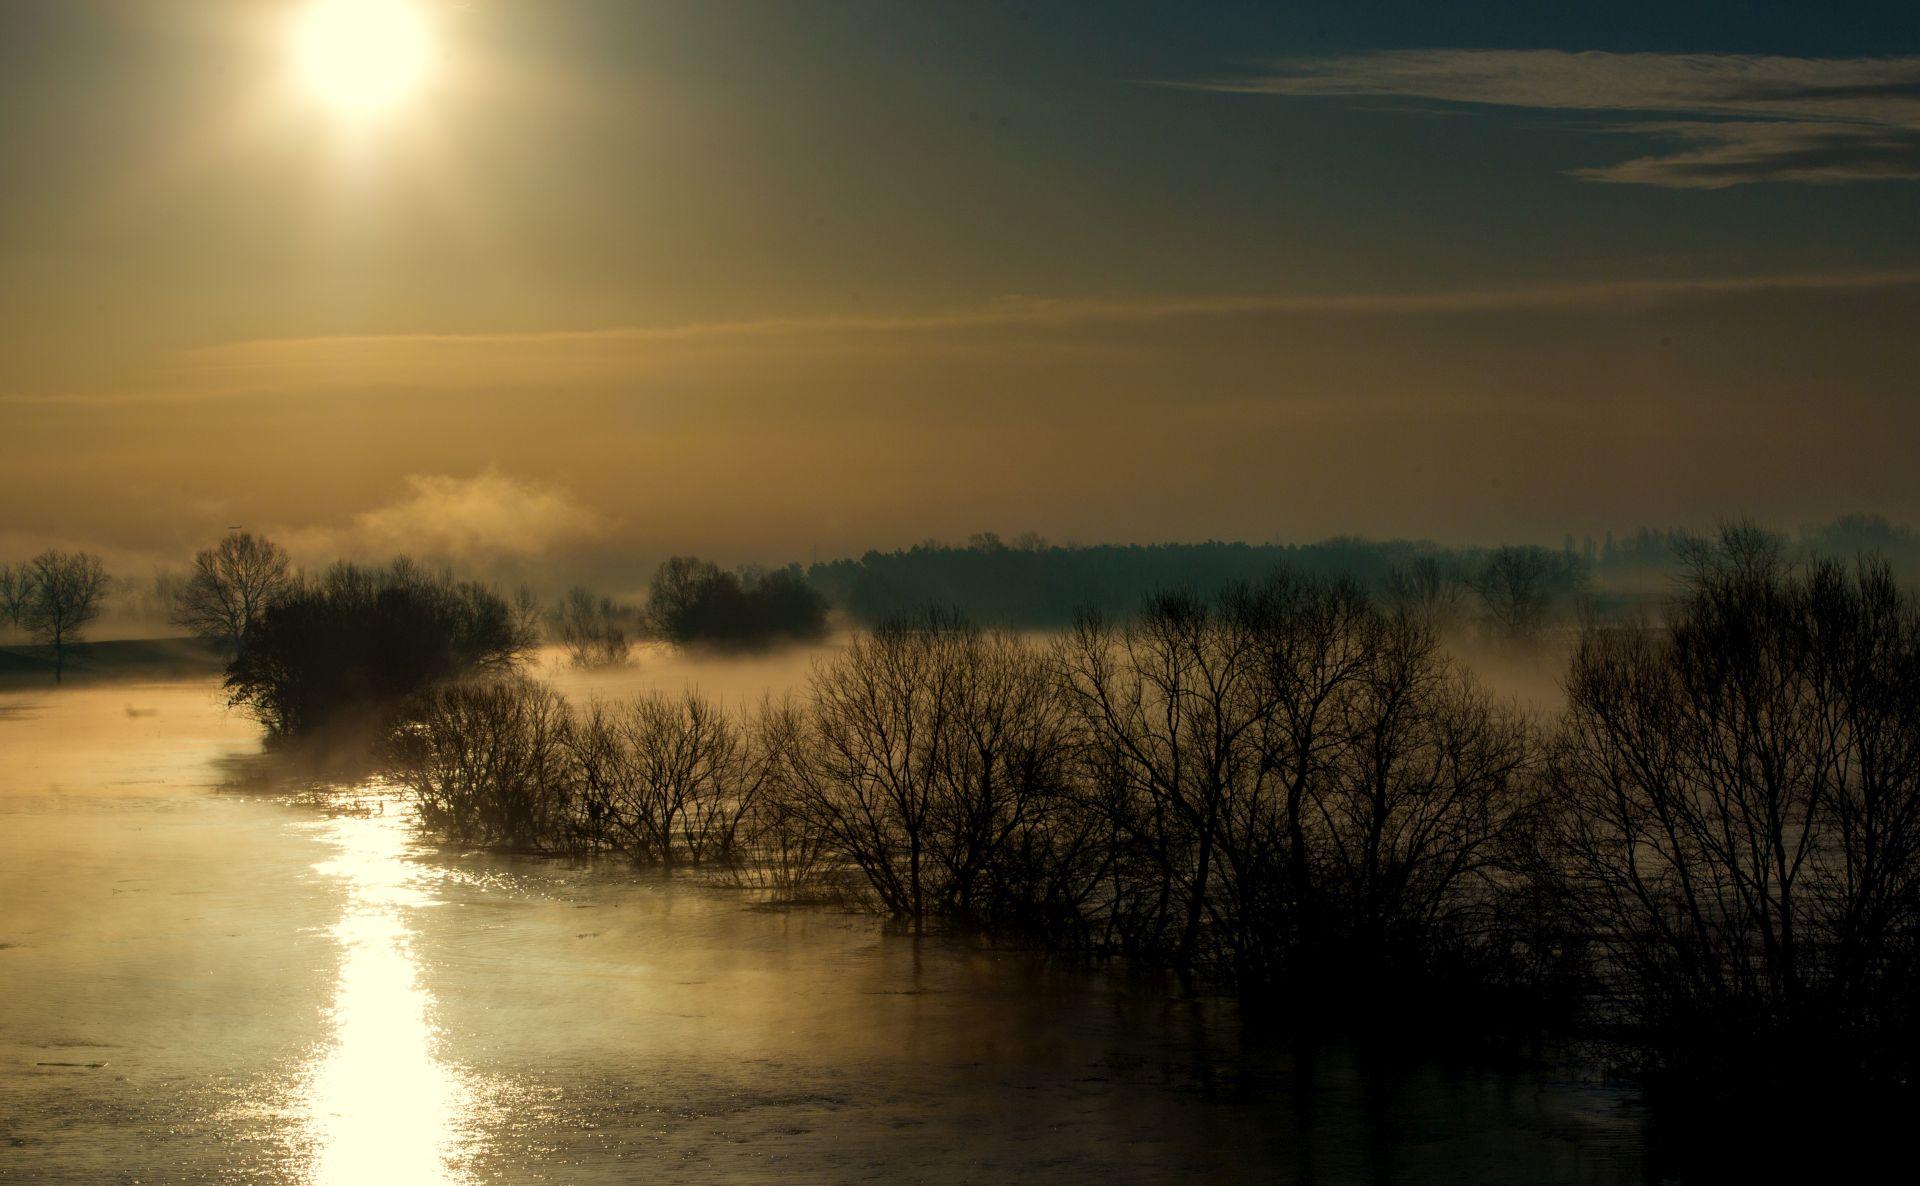 HAK: Magla u Gorskom kotaru usporava vožnju